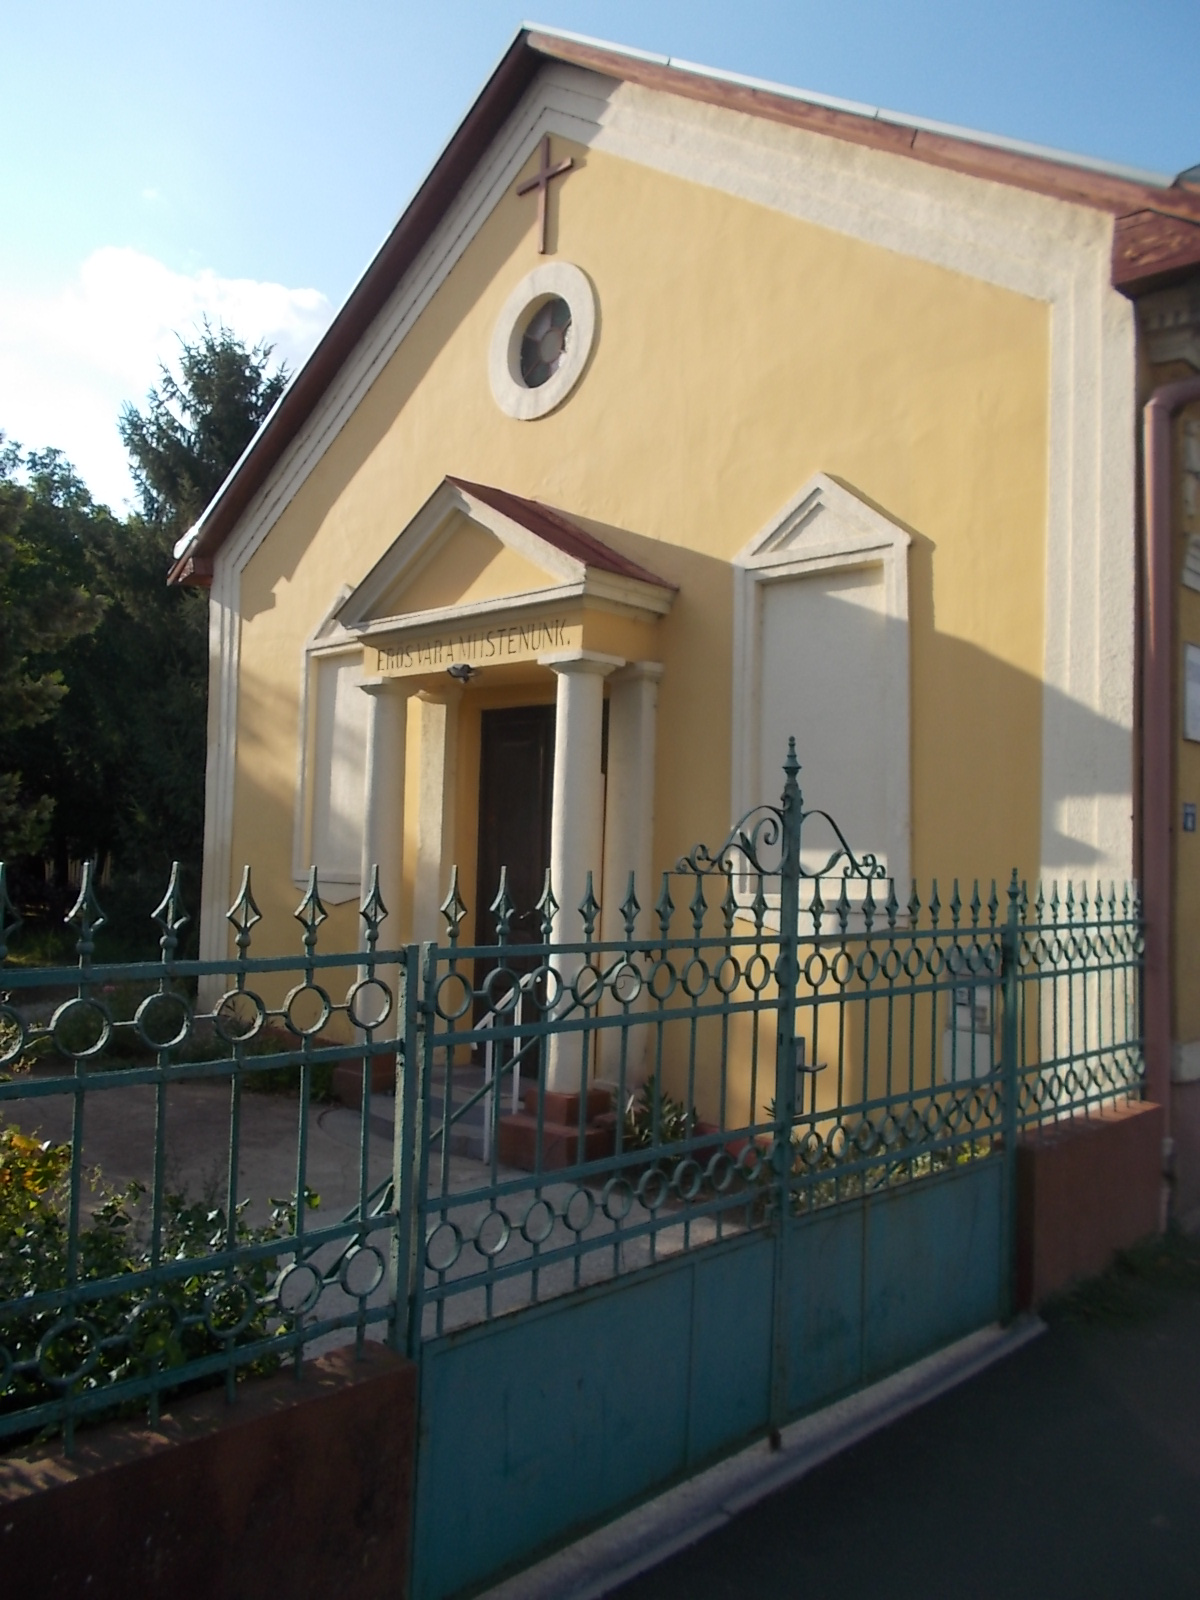 File:Lutheran Small Church, 2017 Nyíregyháza jpg - Wikimedia Commons